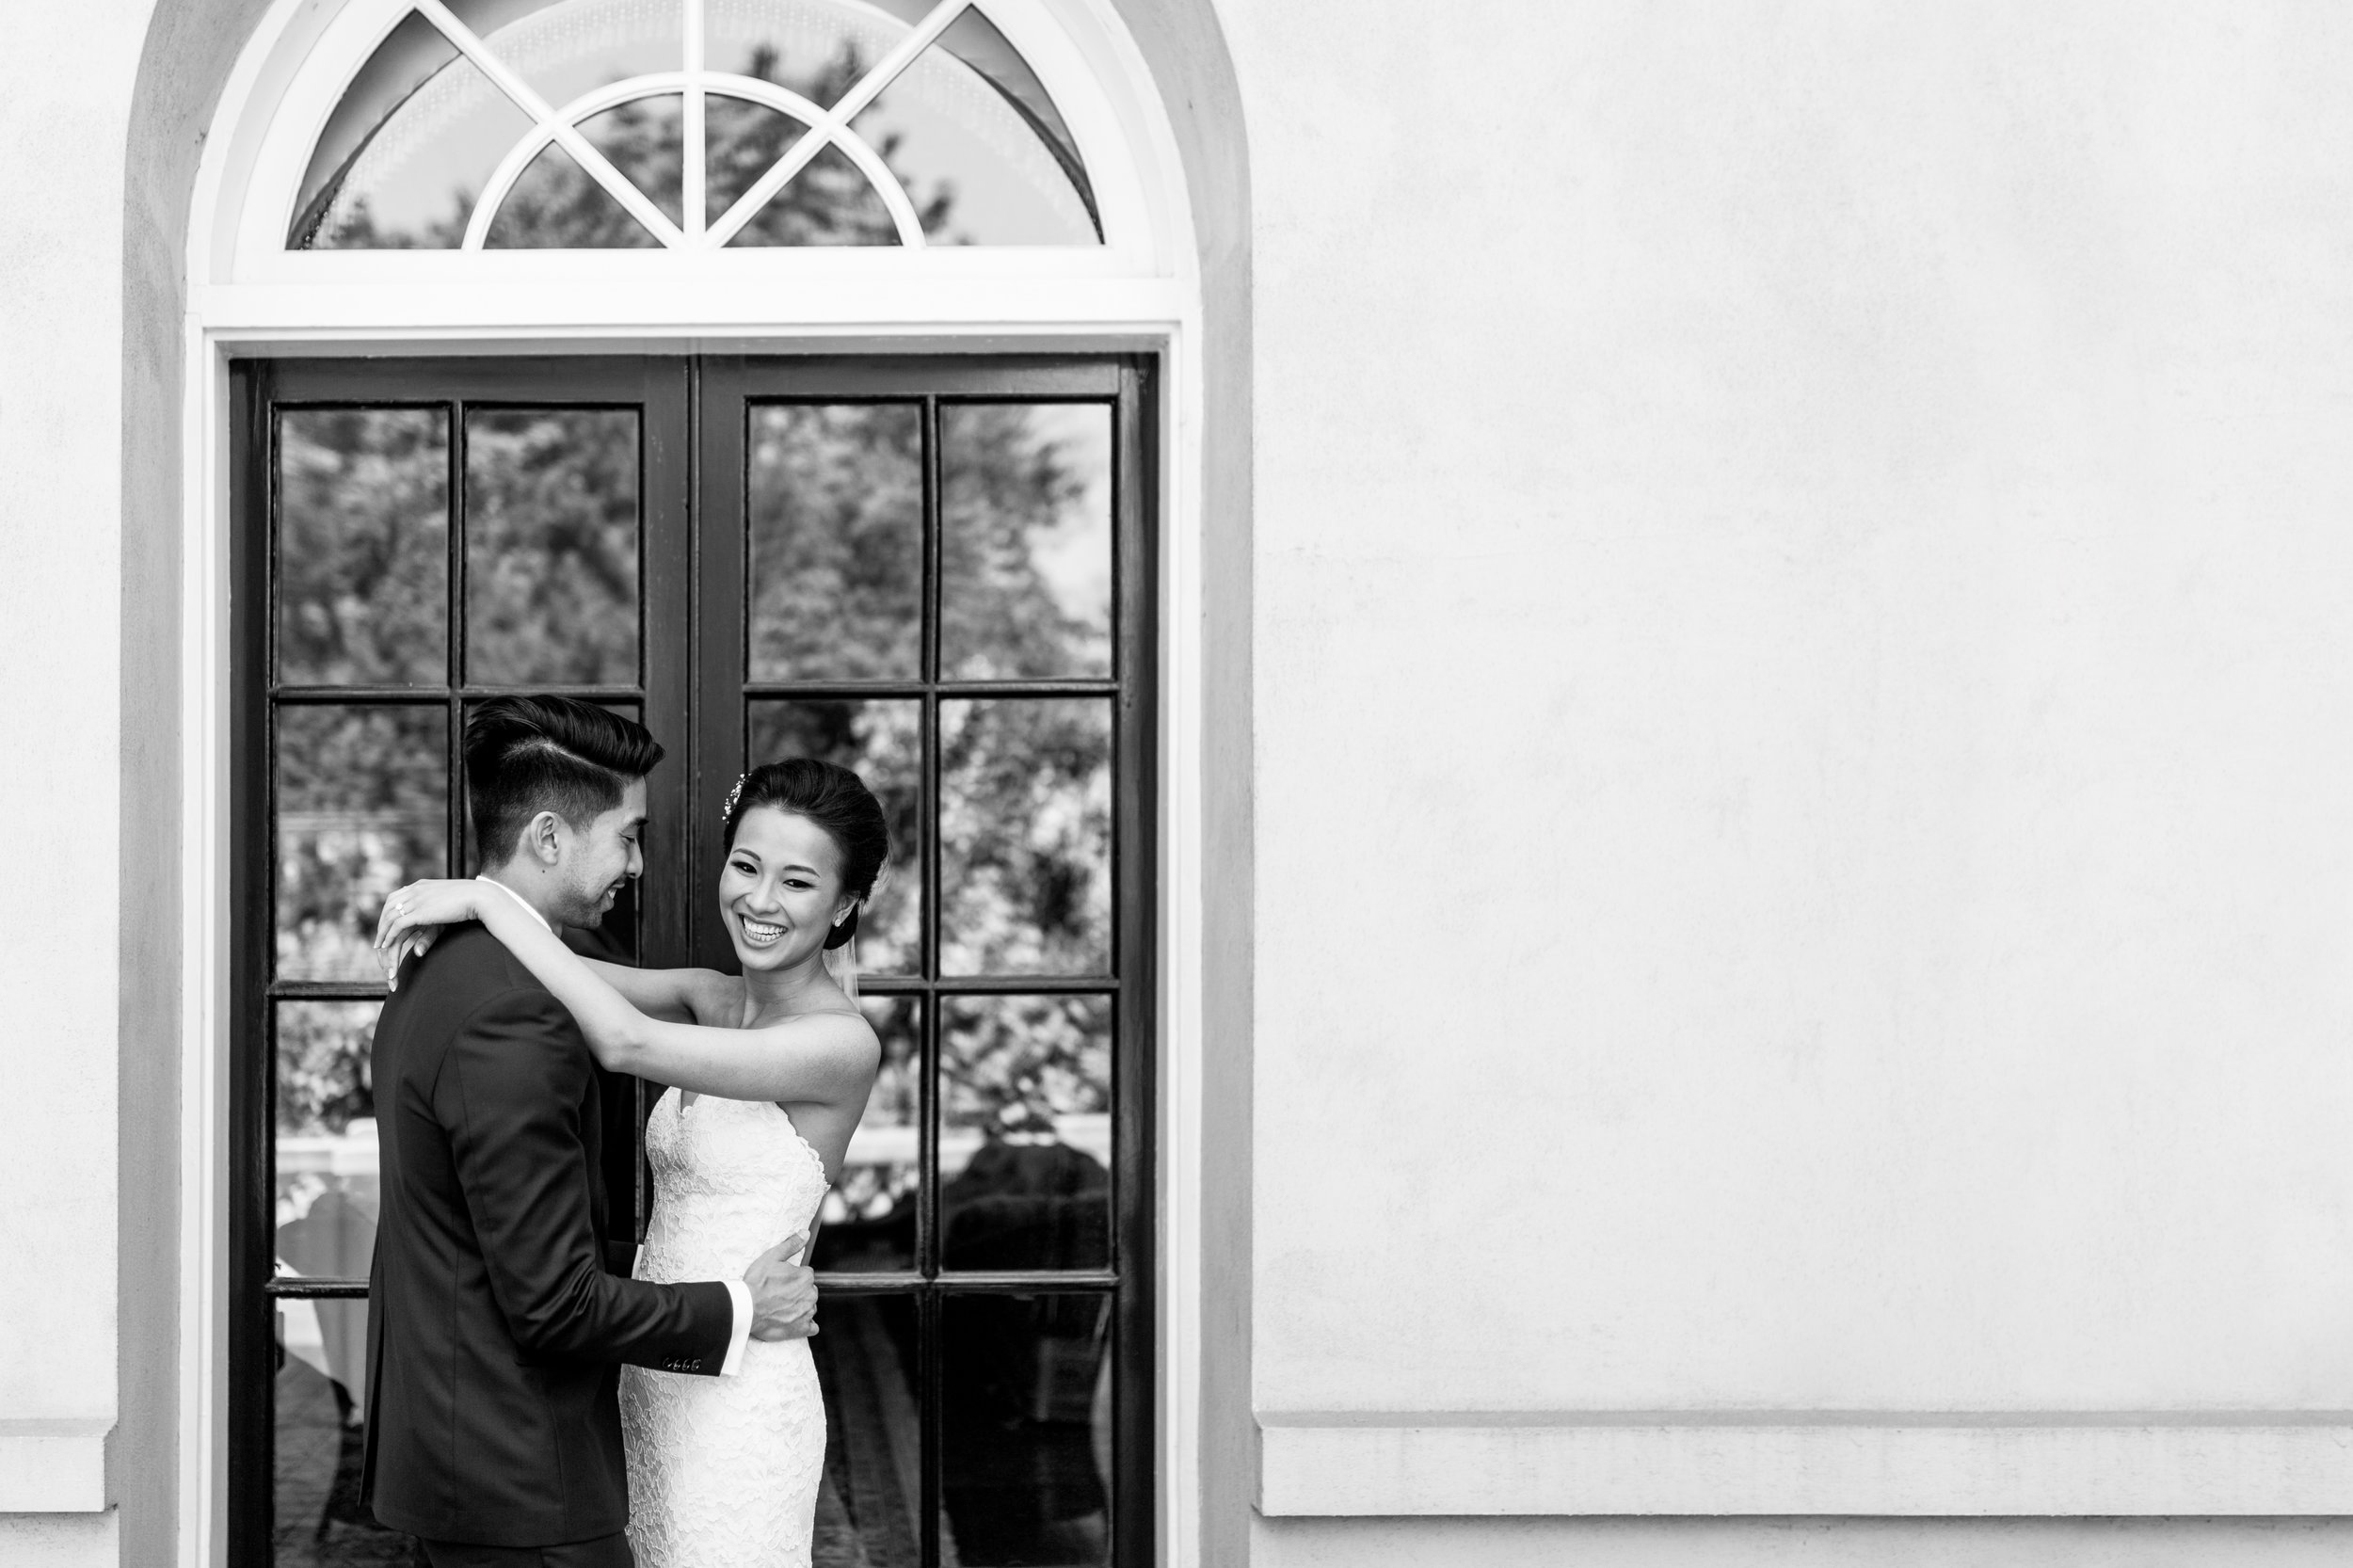 herafilms_wedding_lisa_arthur_hera_selects-53.jpg